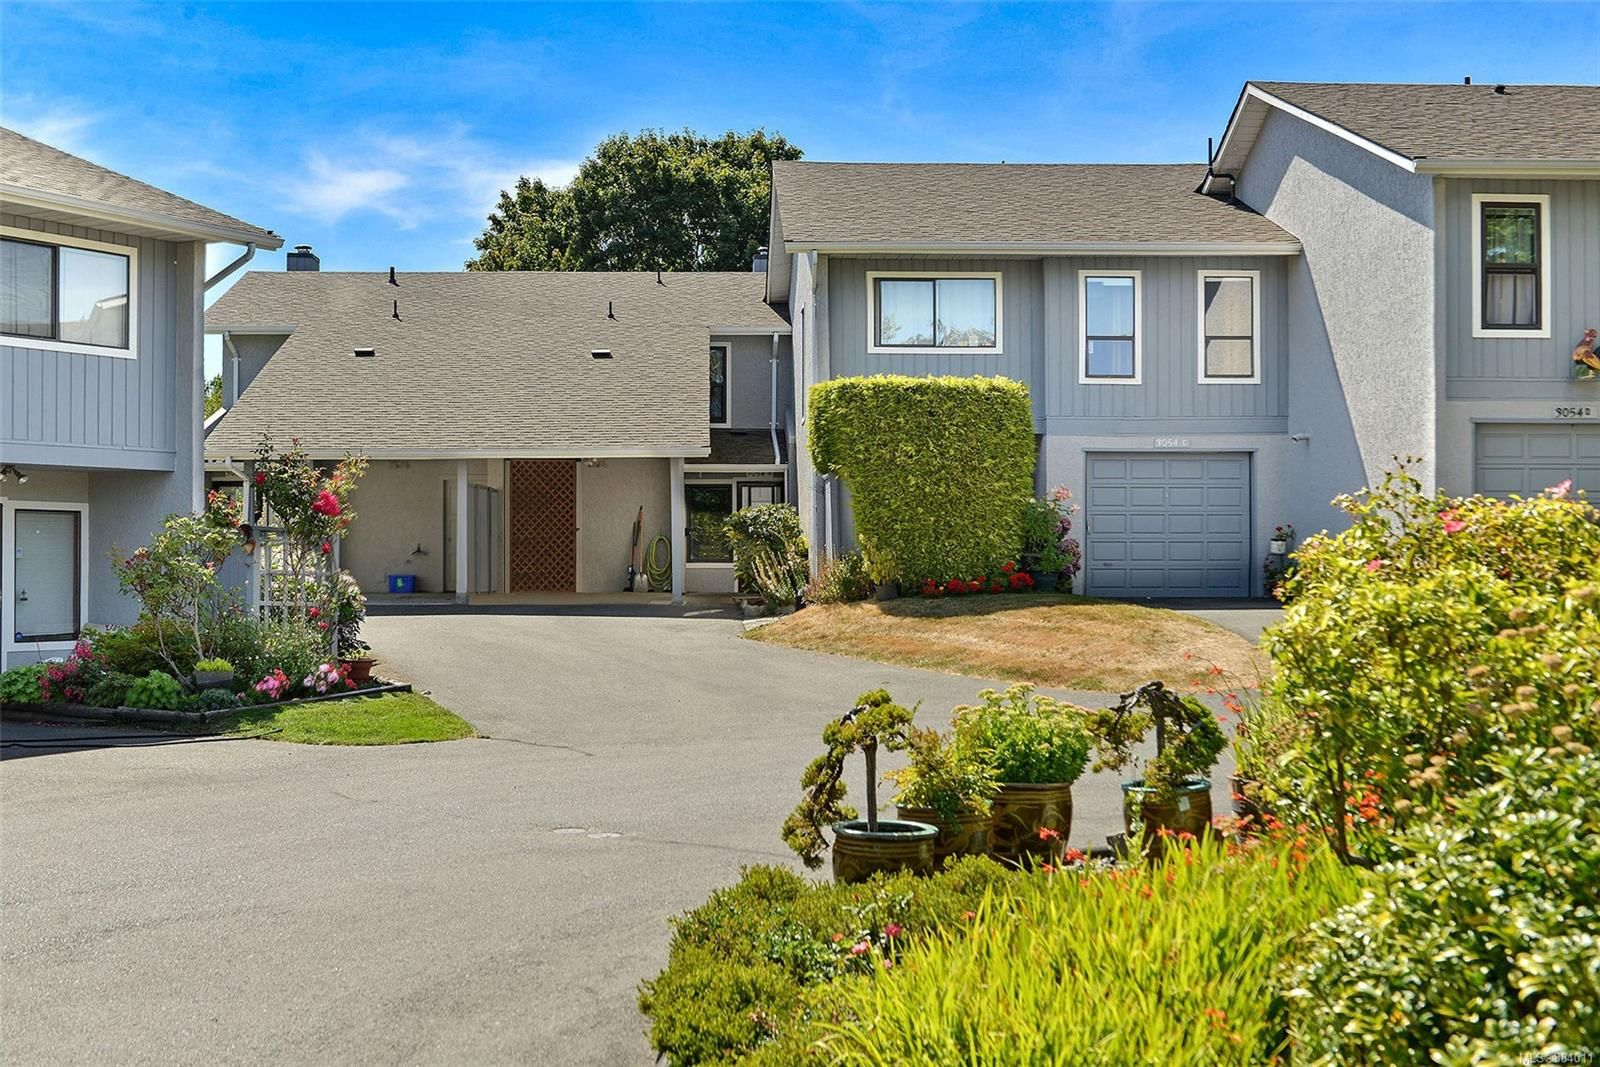 Main Photo: B 3054 Washington Ave in : Vi Burnside Row/Townhouse for sale (Victoria)  : MLS®# 884011